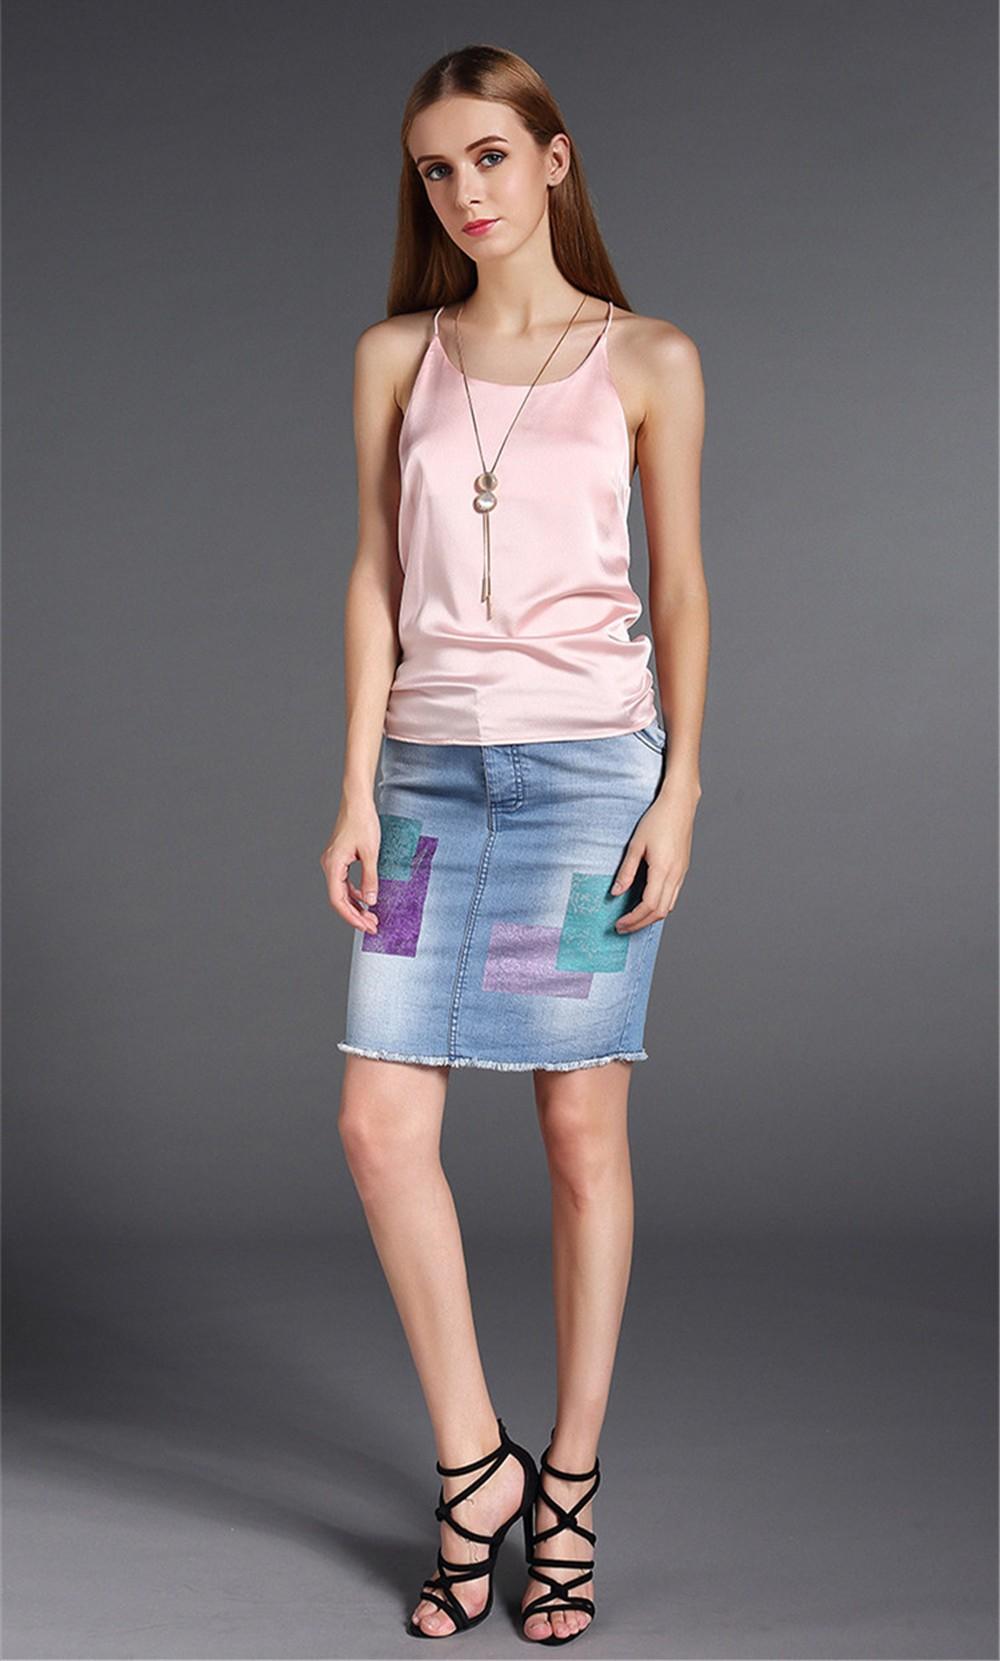 Plus Size S-4XL Multiple Women Tank Tops Brand Silk Blending Sleeveless Tshirt Women Female Shirt Smooth Blouse Blusas Femininas (11)